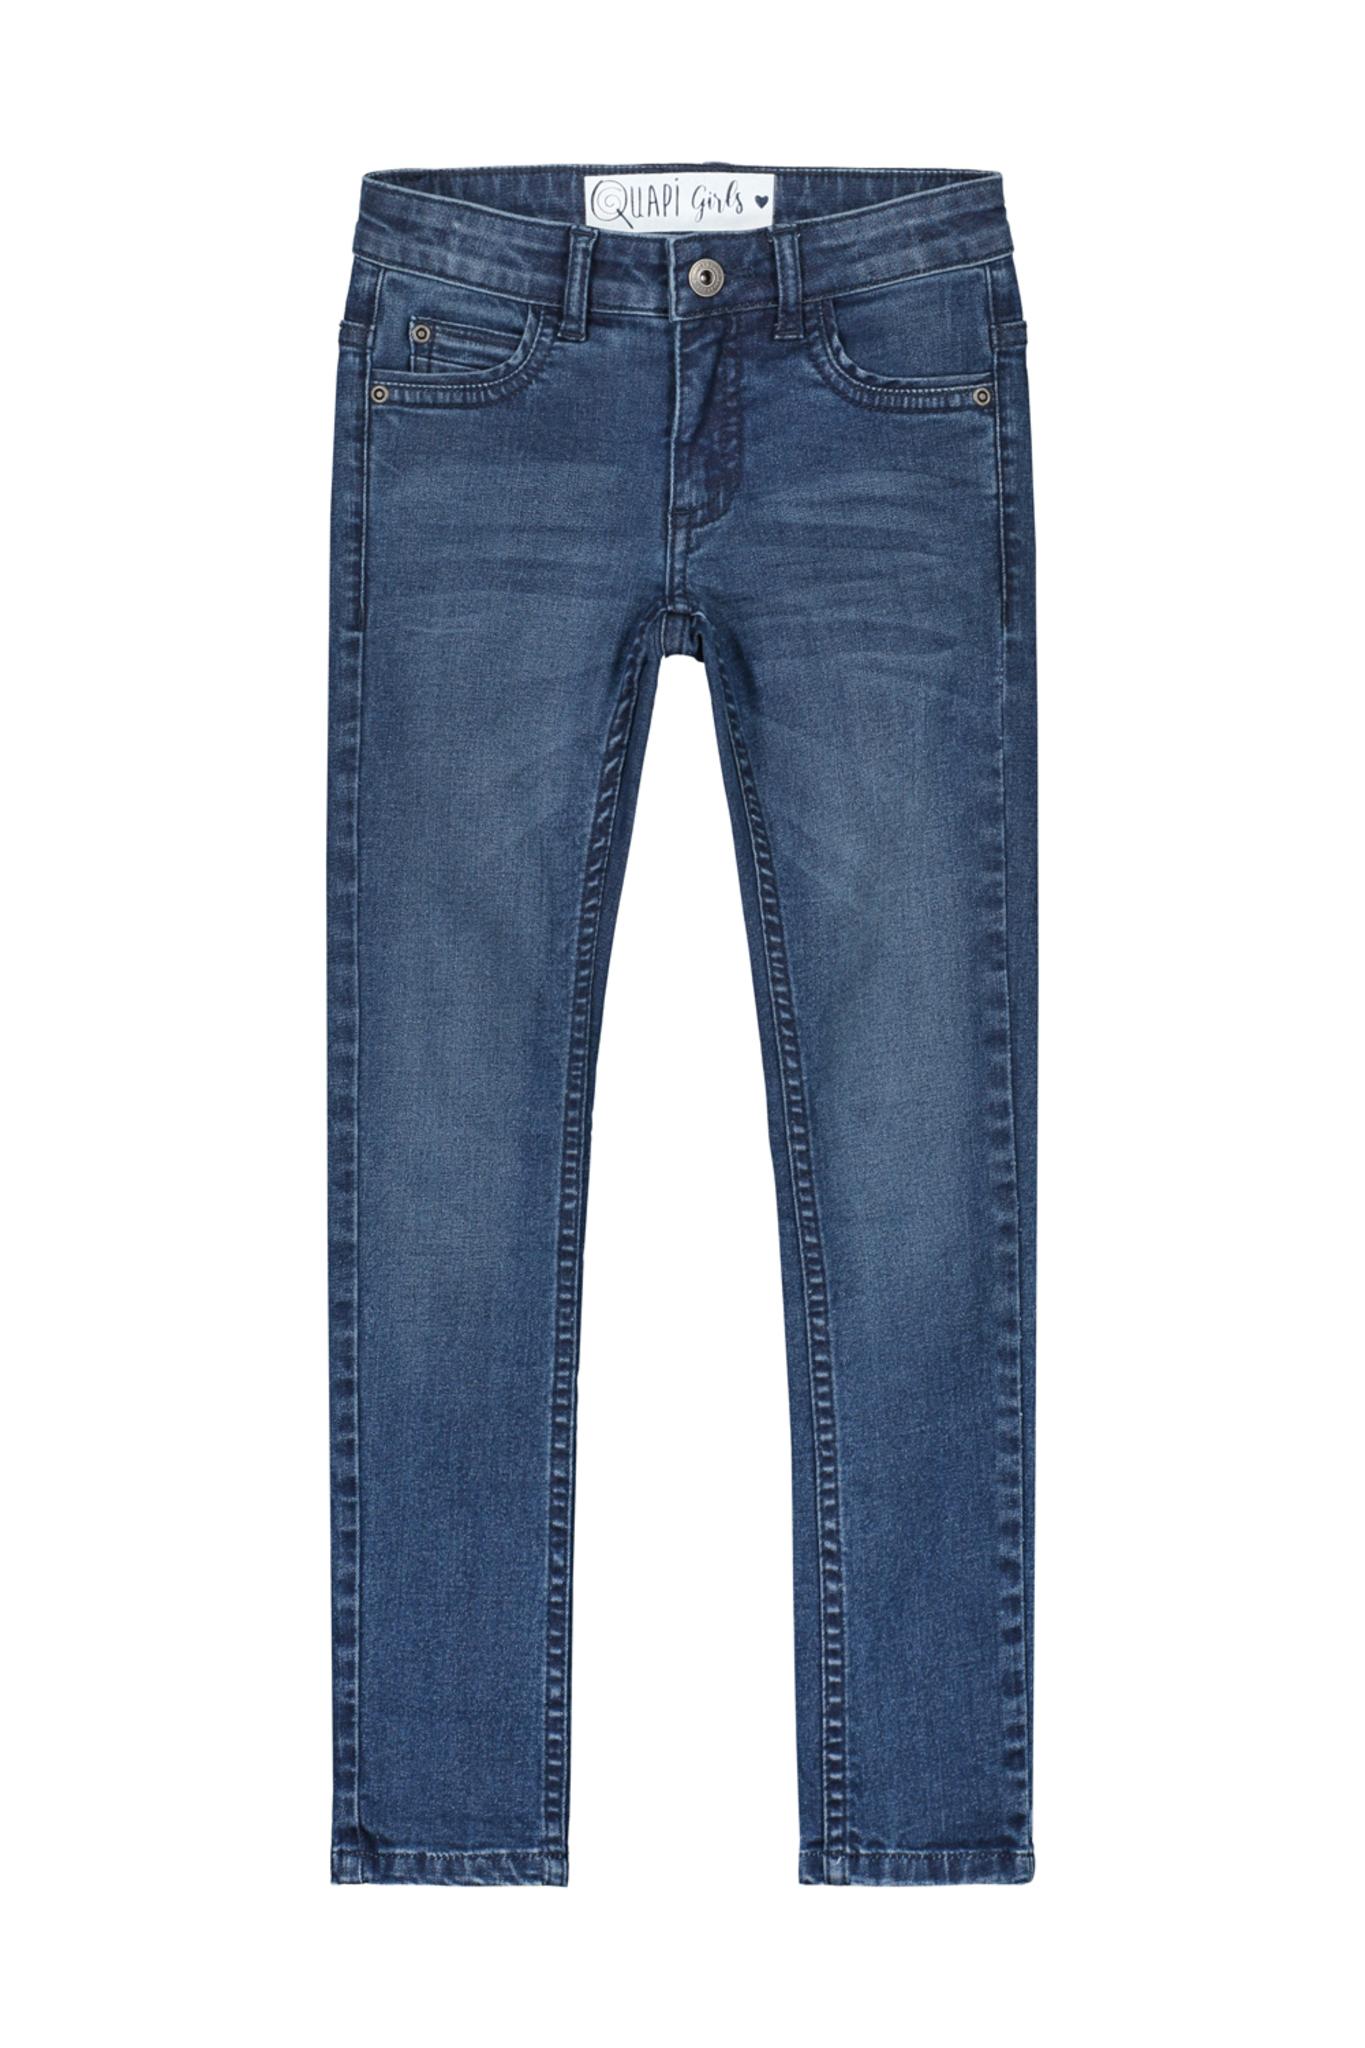 Quapi Girl Jeans Josine blue